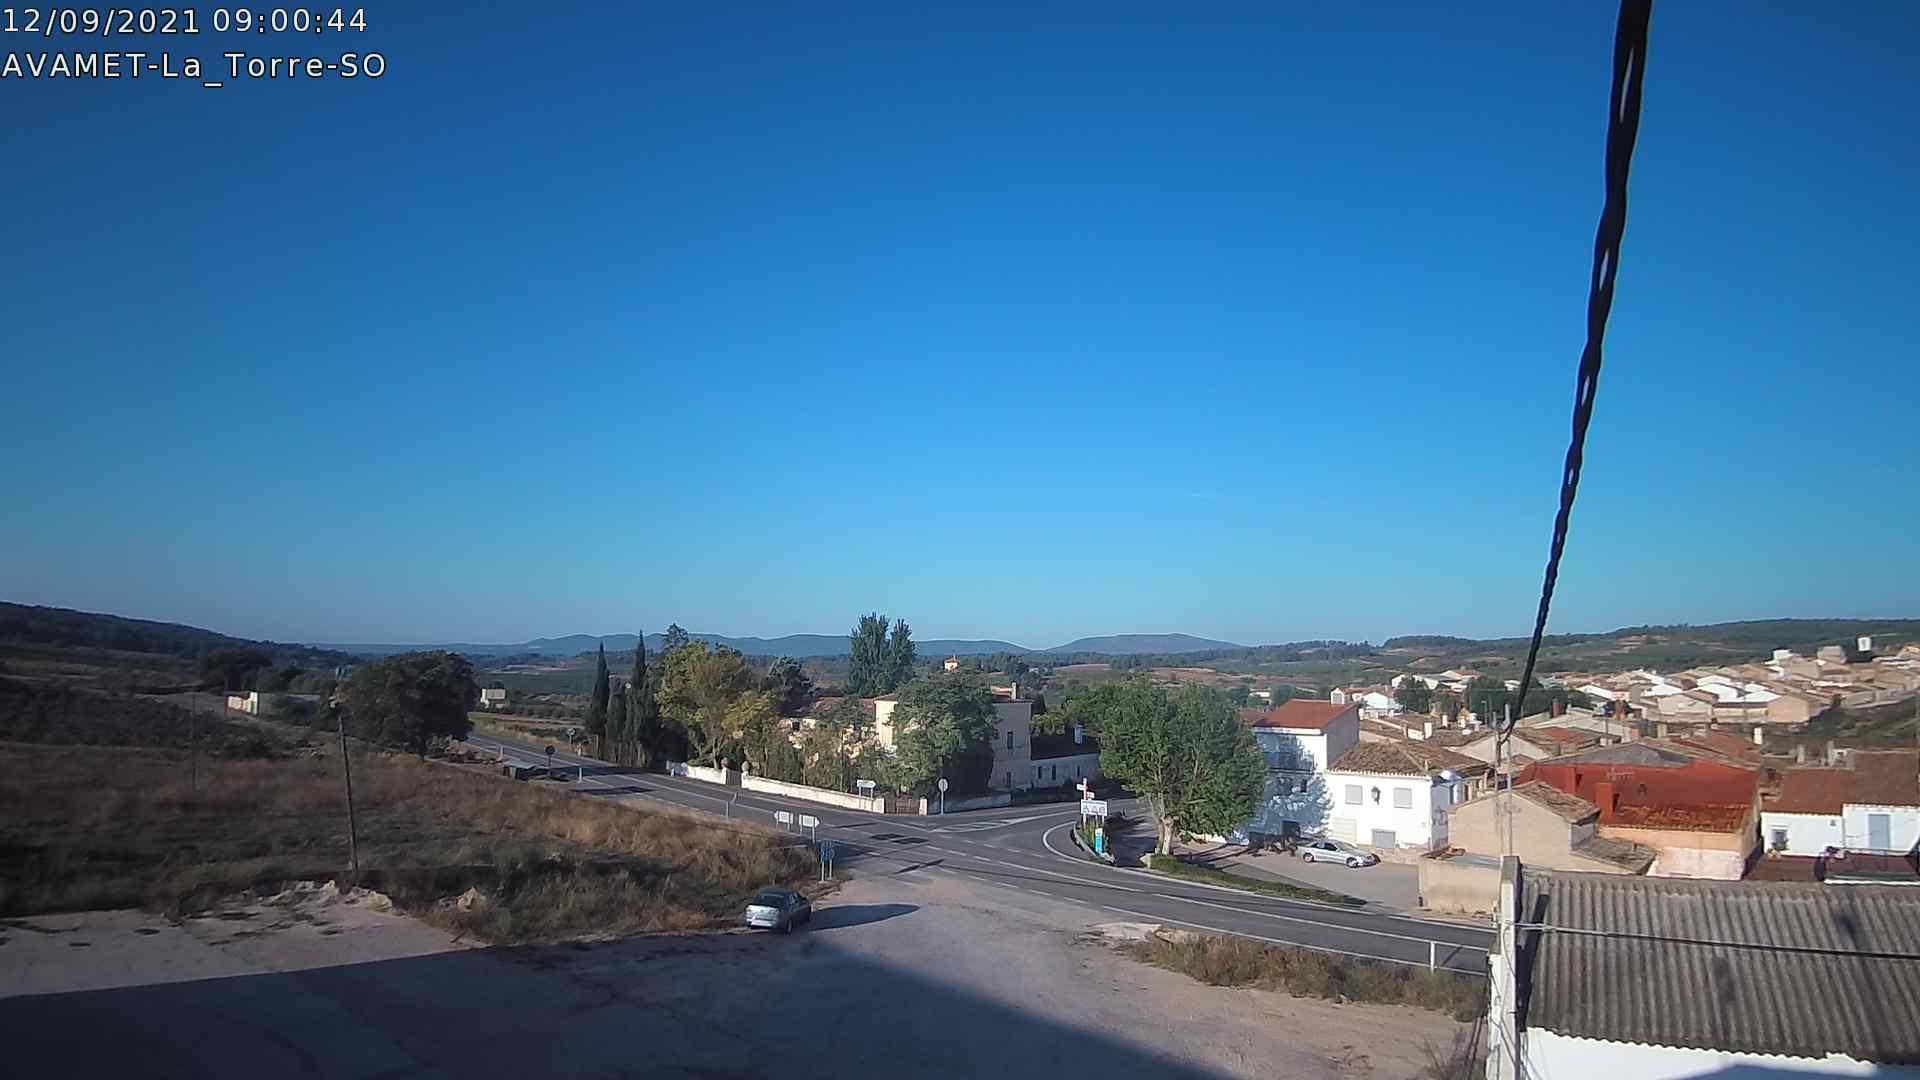 time-lapse frame, Coratxà AVAMET webcam